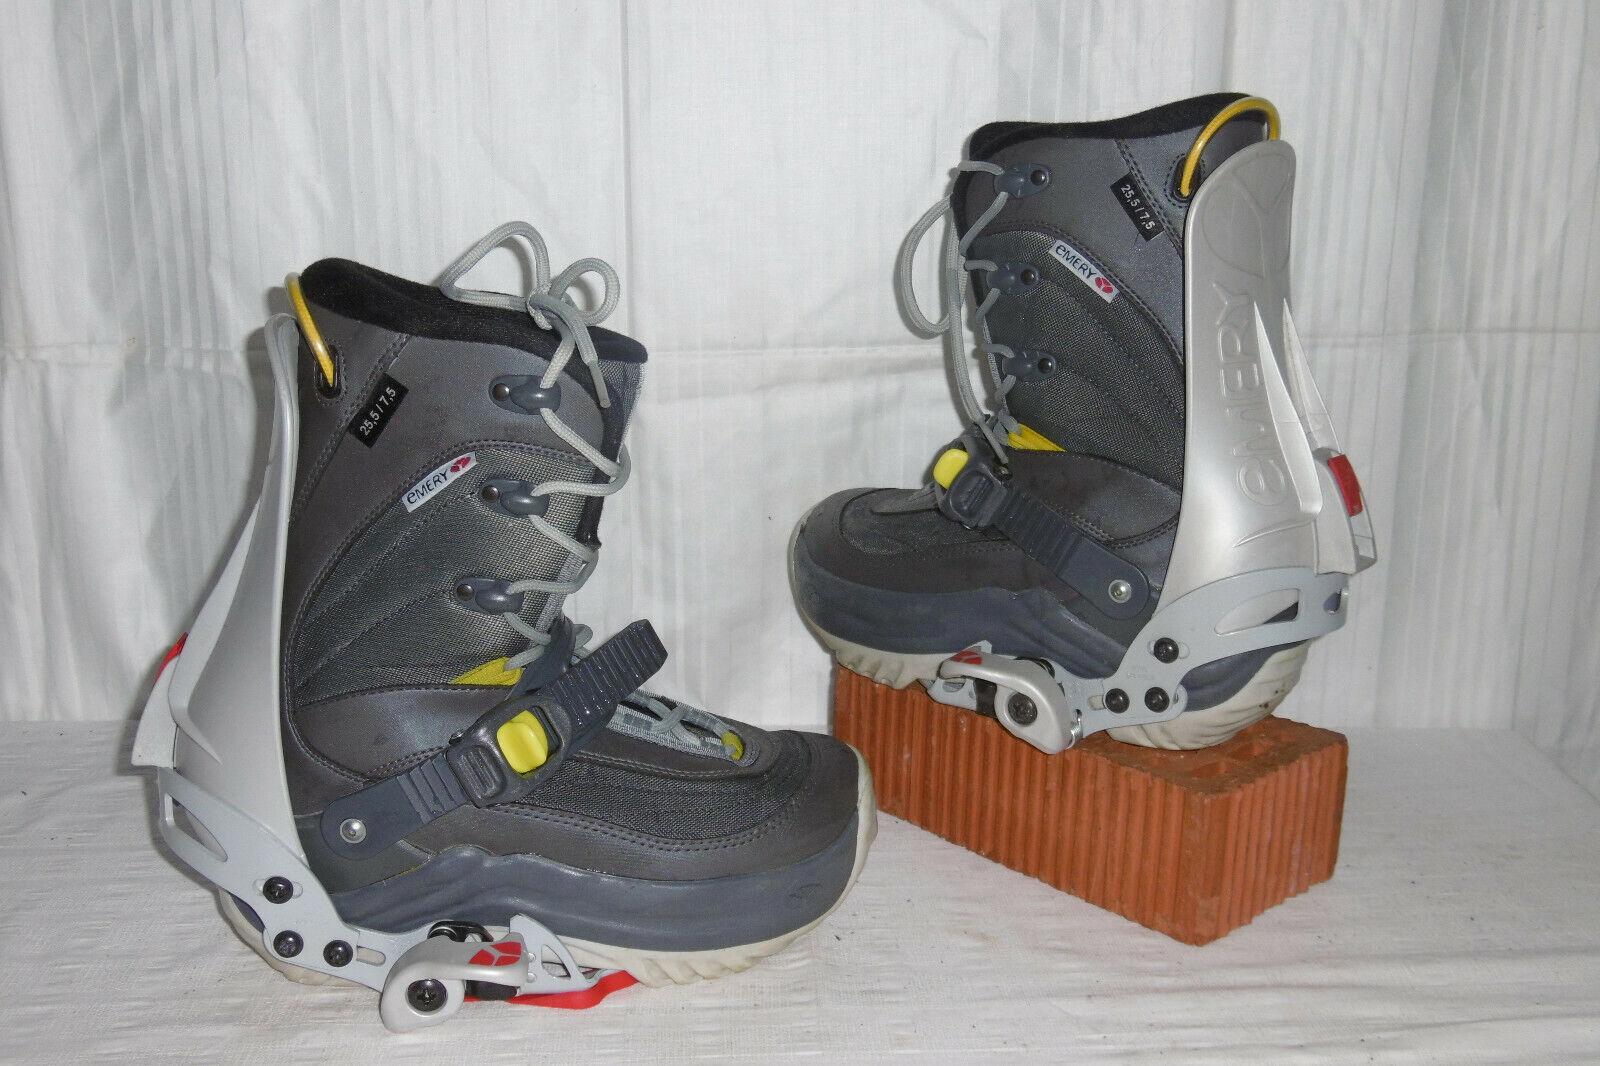 EMERY   ROC SIS     SNOWBOARD STEP-IN Stiefel GR  39 + EMERY STEP-IN BINDUNG 9eb9a3